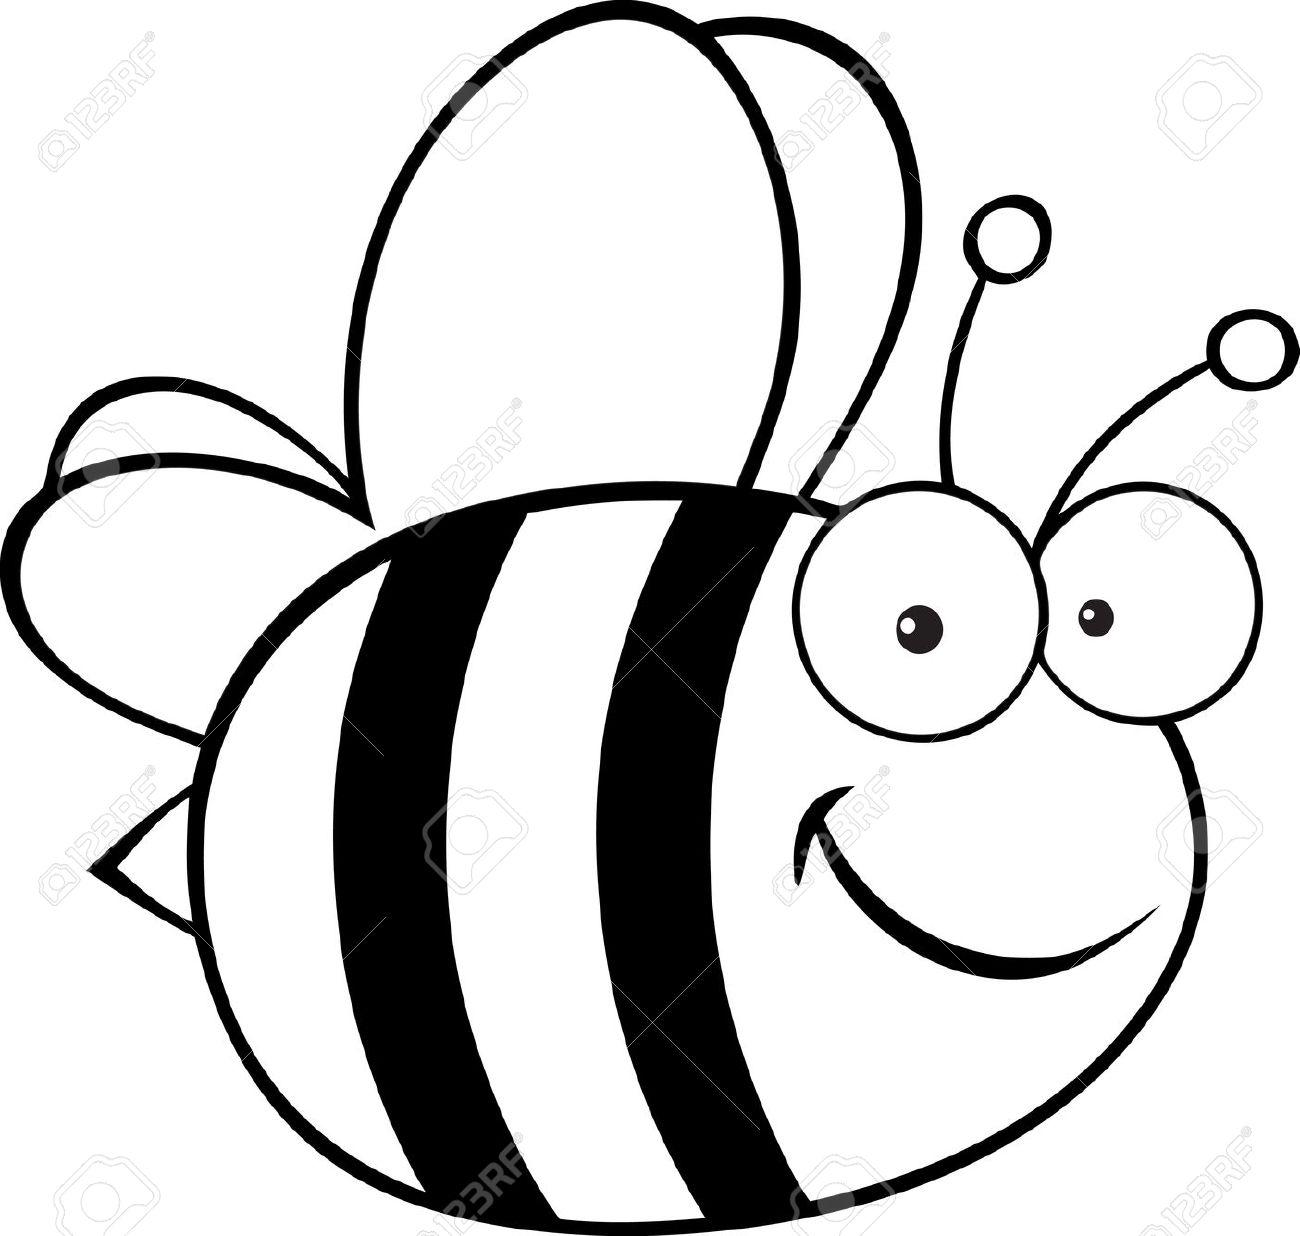 1300x1236 Bumblebee clipart drawn